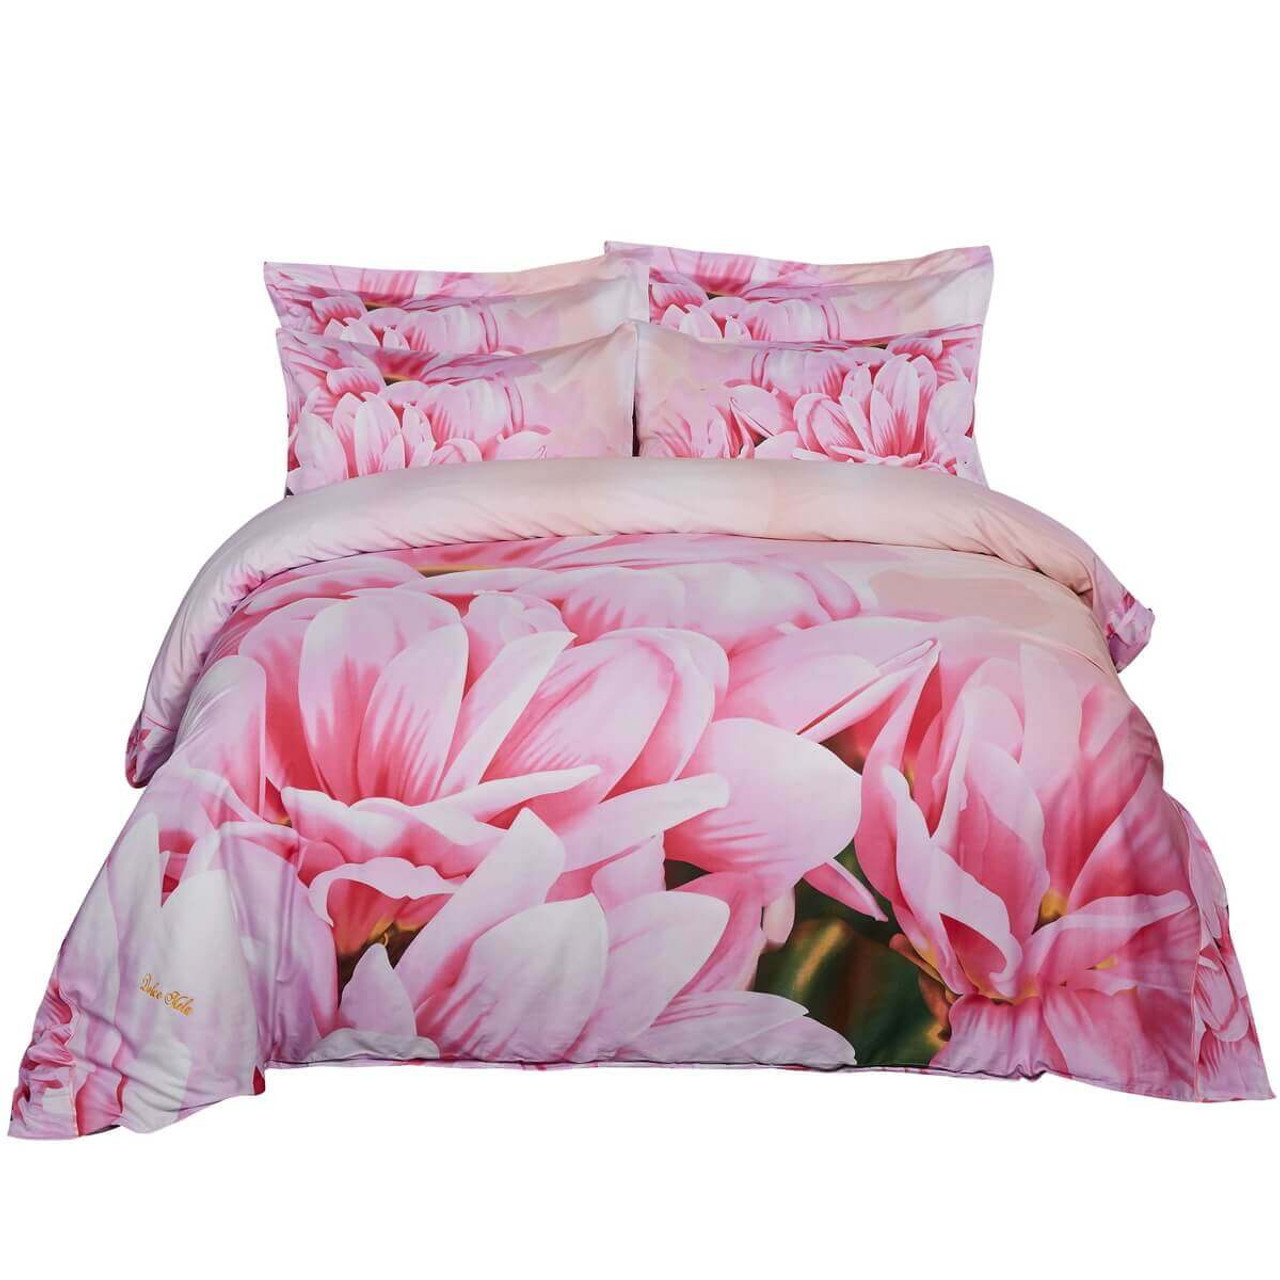 Floral Bedding, Dolce Mela - May DM701K  Drop-shipping